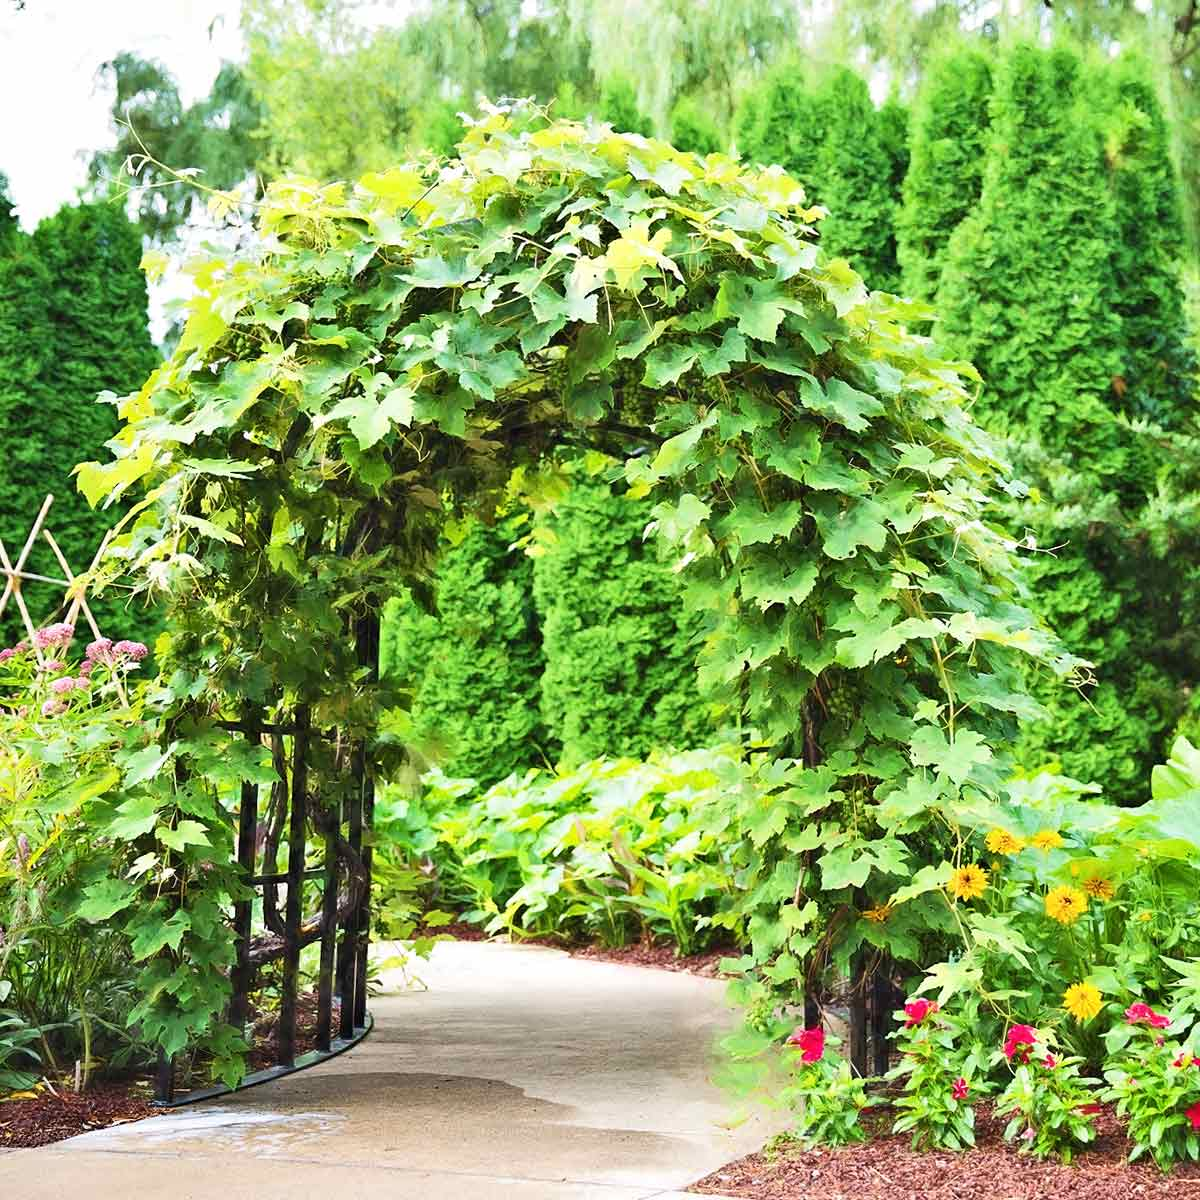 Pergola, tonnelle et arche de jardin | jardins-animes.com